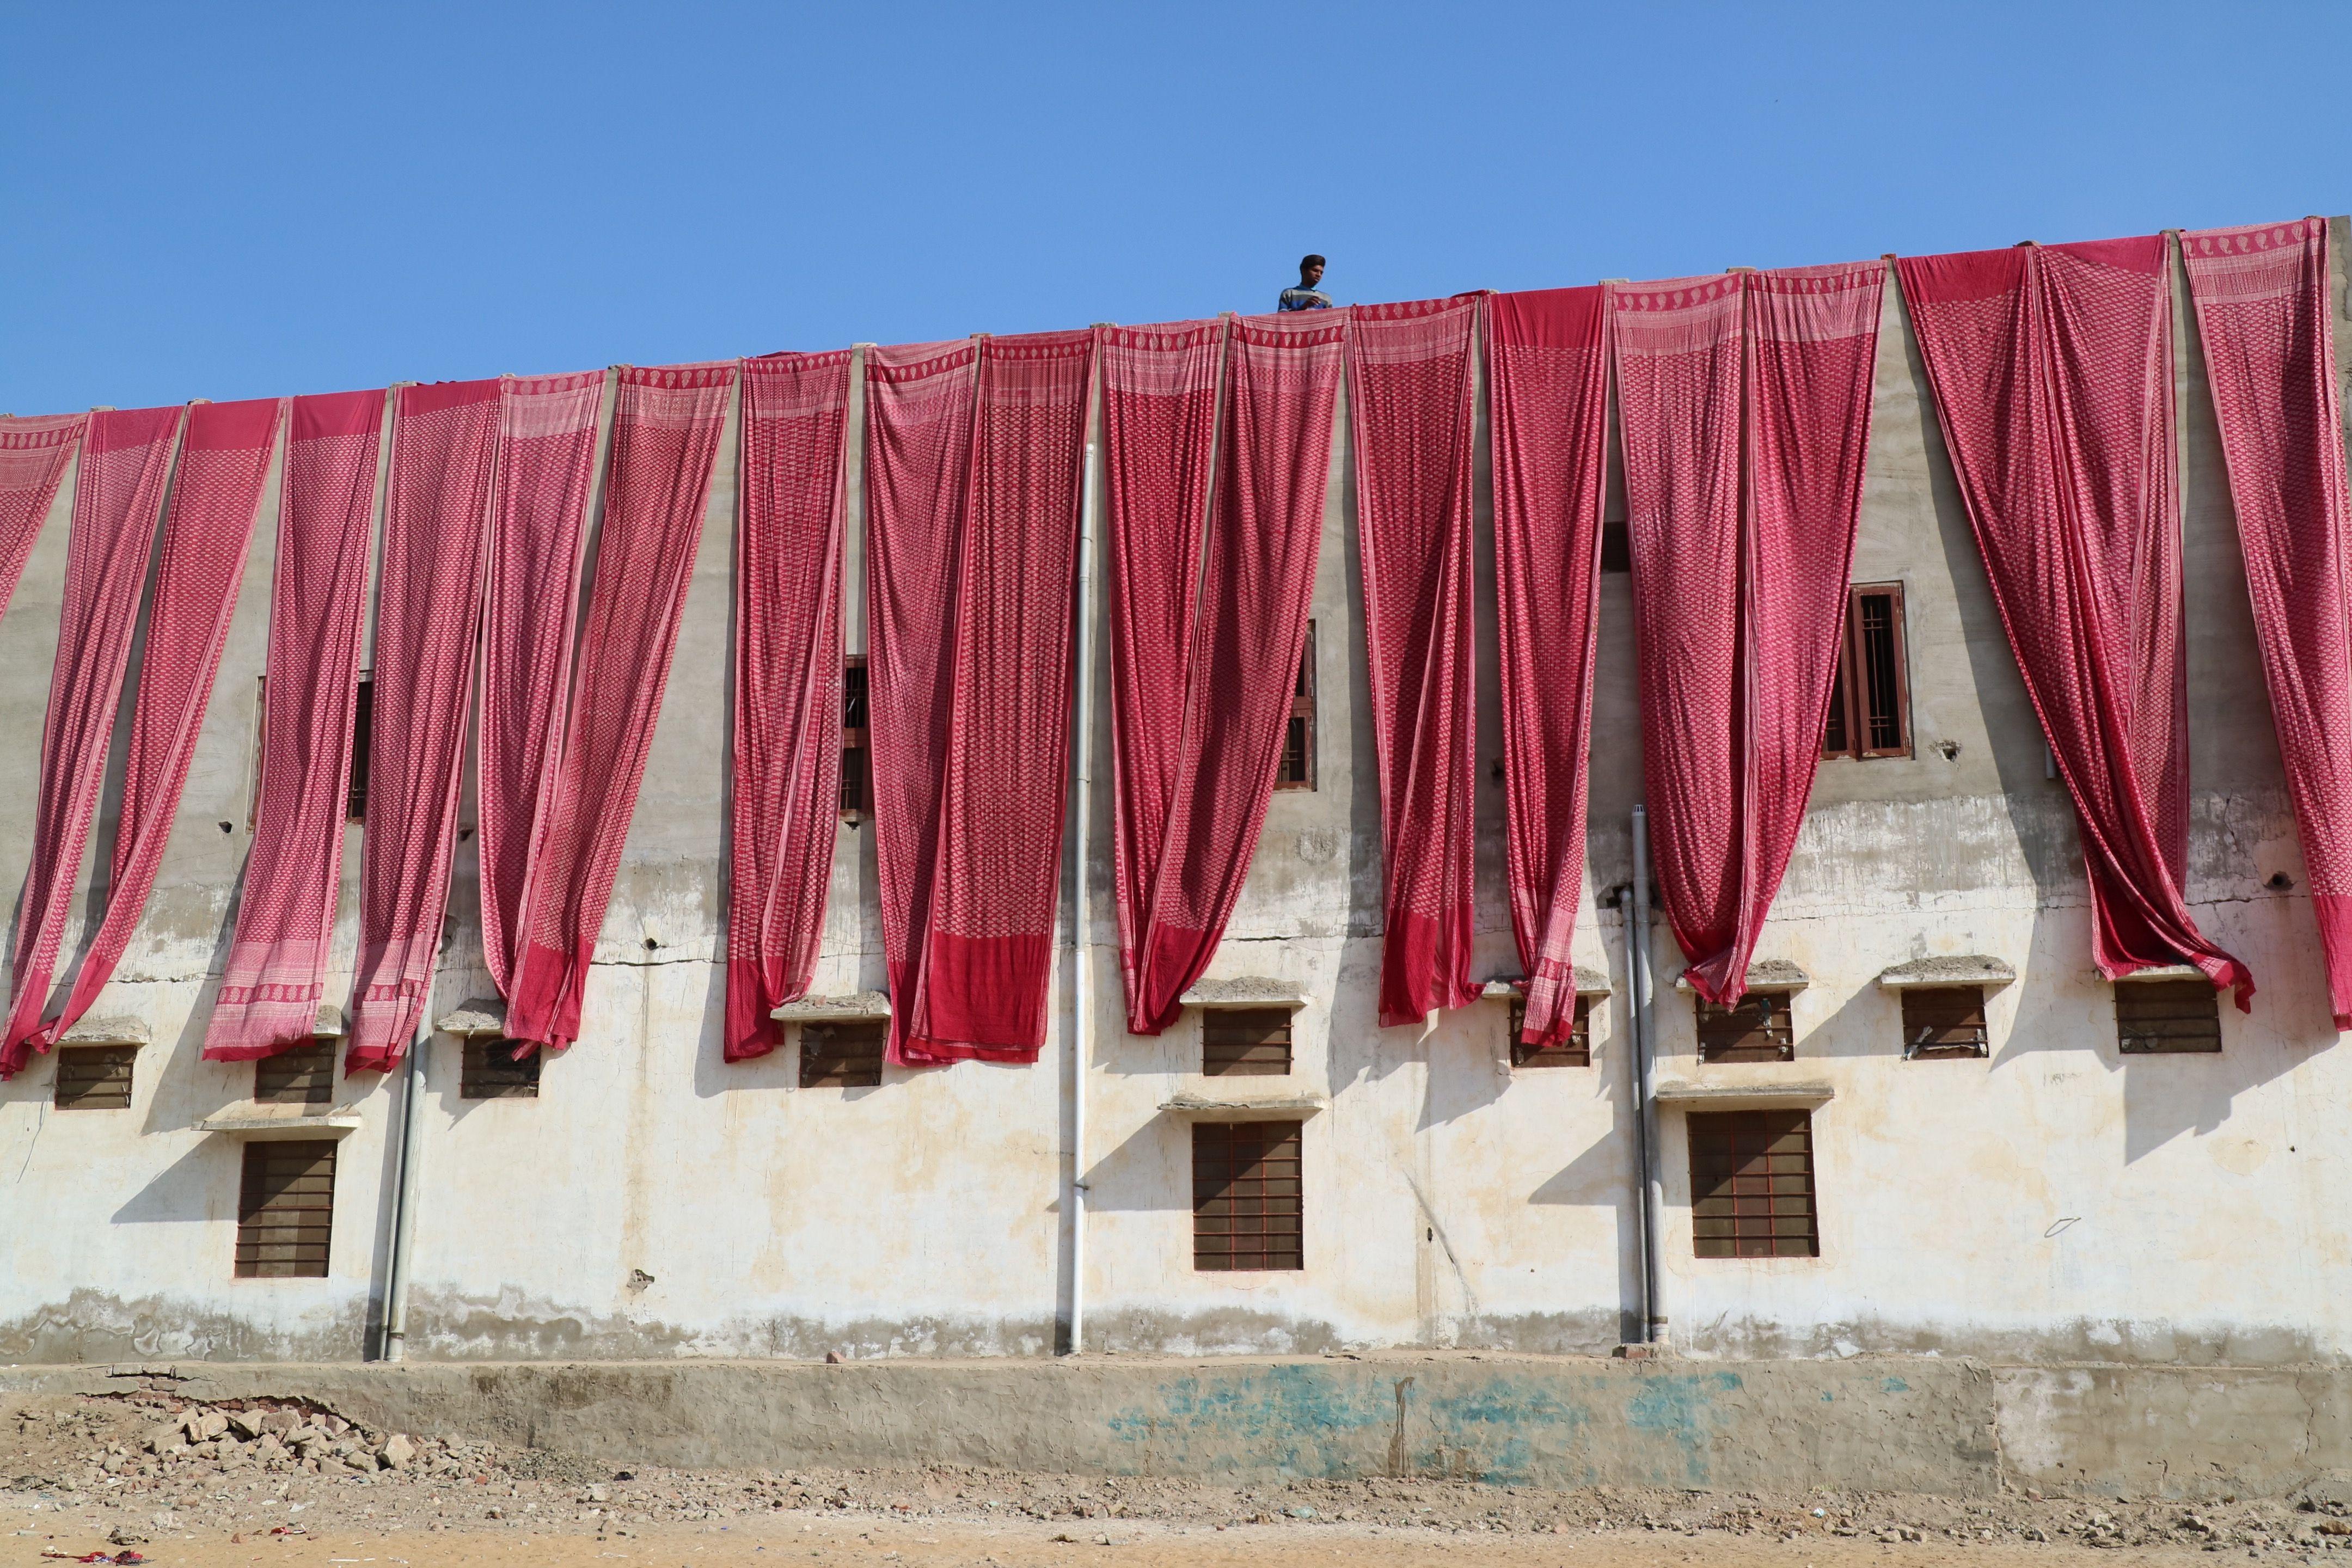 All the amazing block printing fabric drying in the wind block jpg  4320x2880 Fabric wind block 2135a57fb